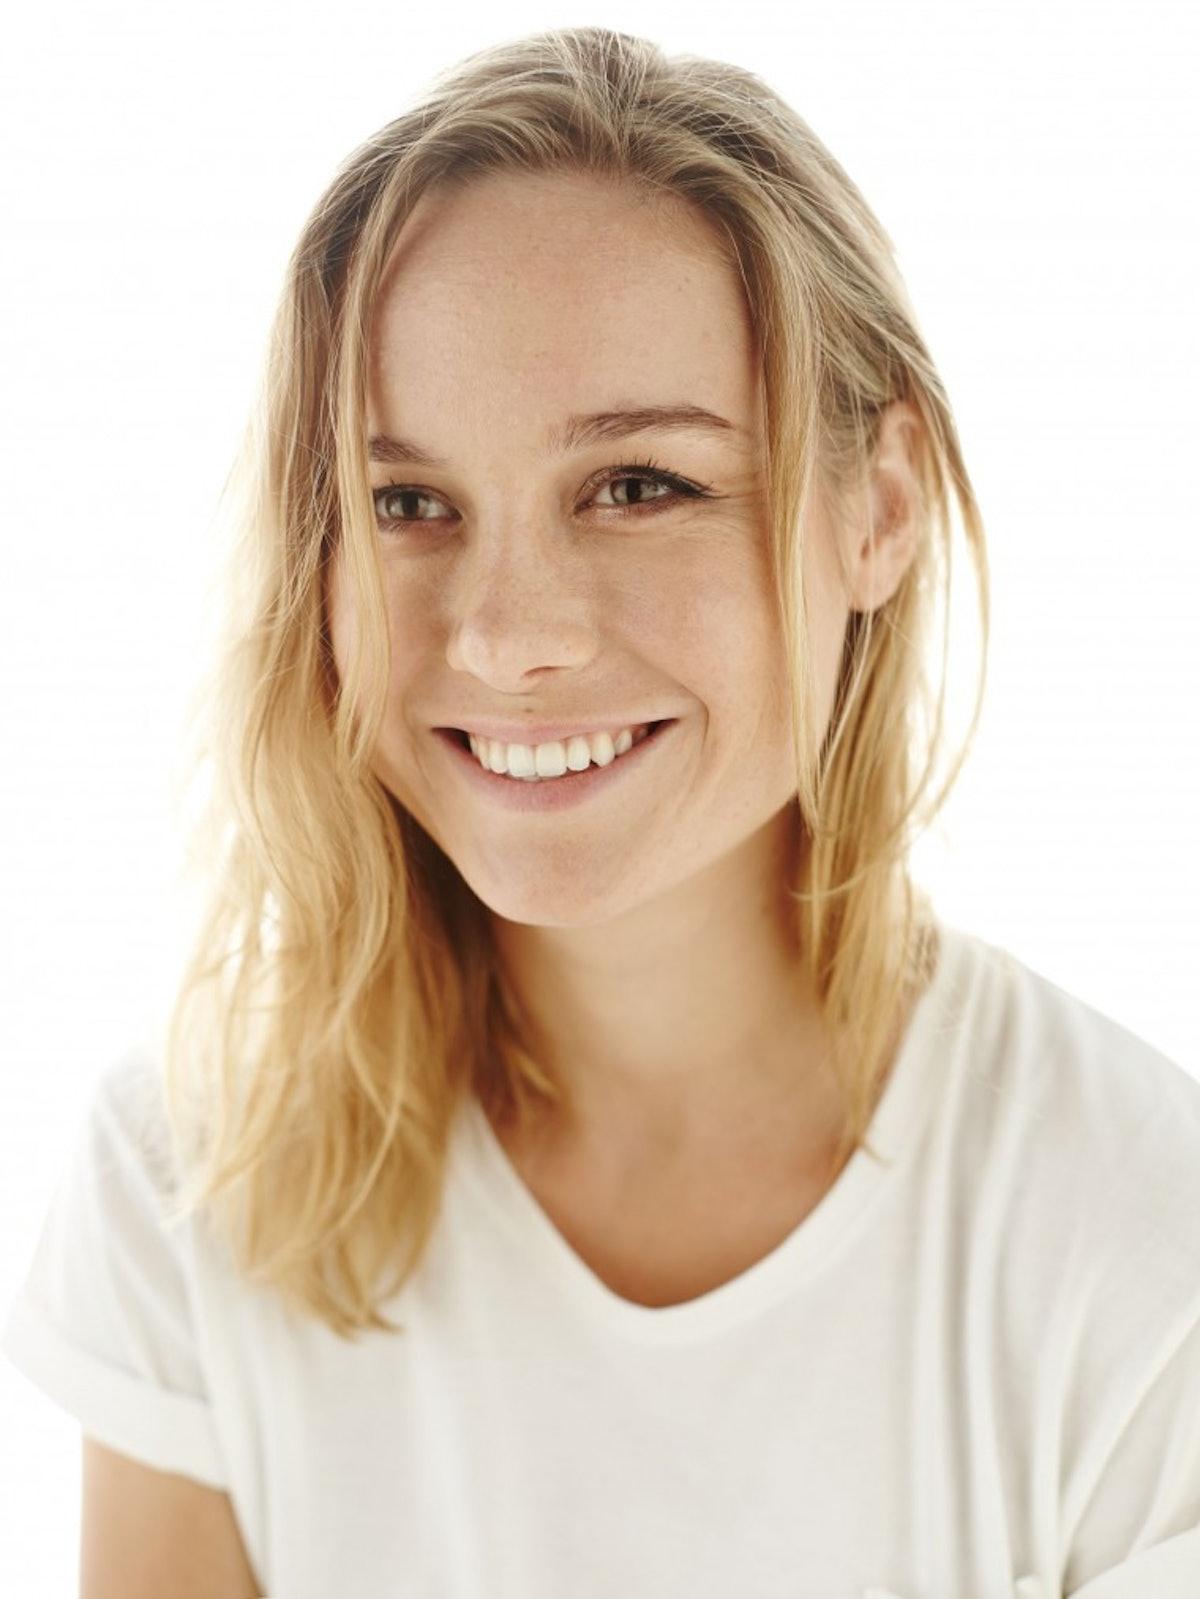 cear-brie-larson-actress-01-e1377017459774-760x1013.jpg